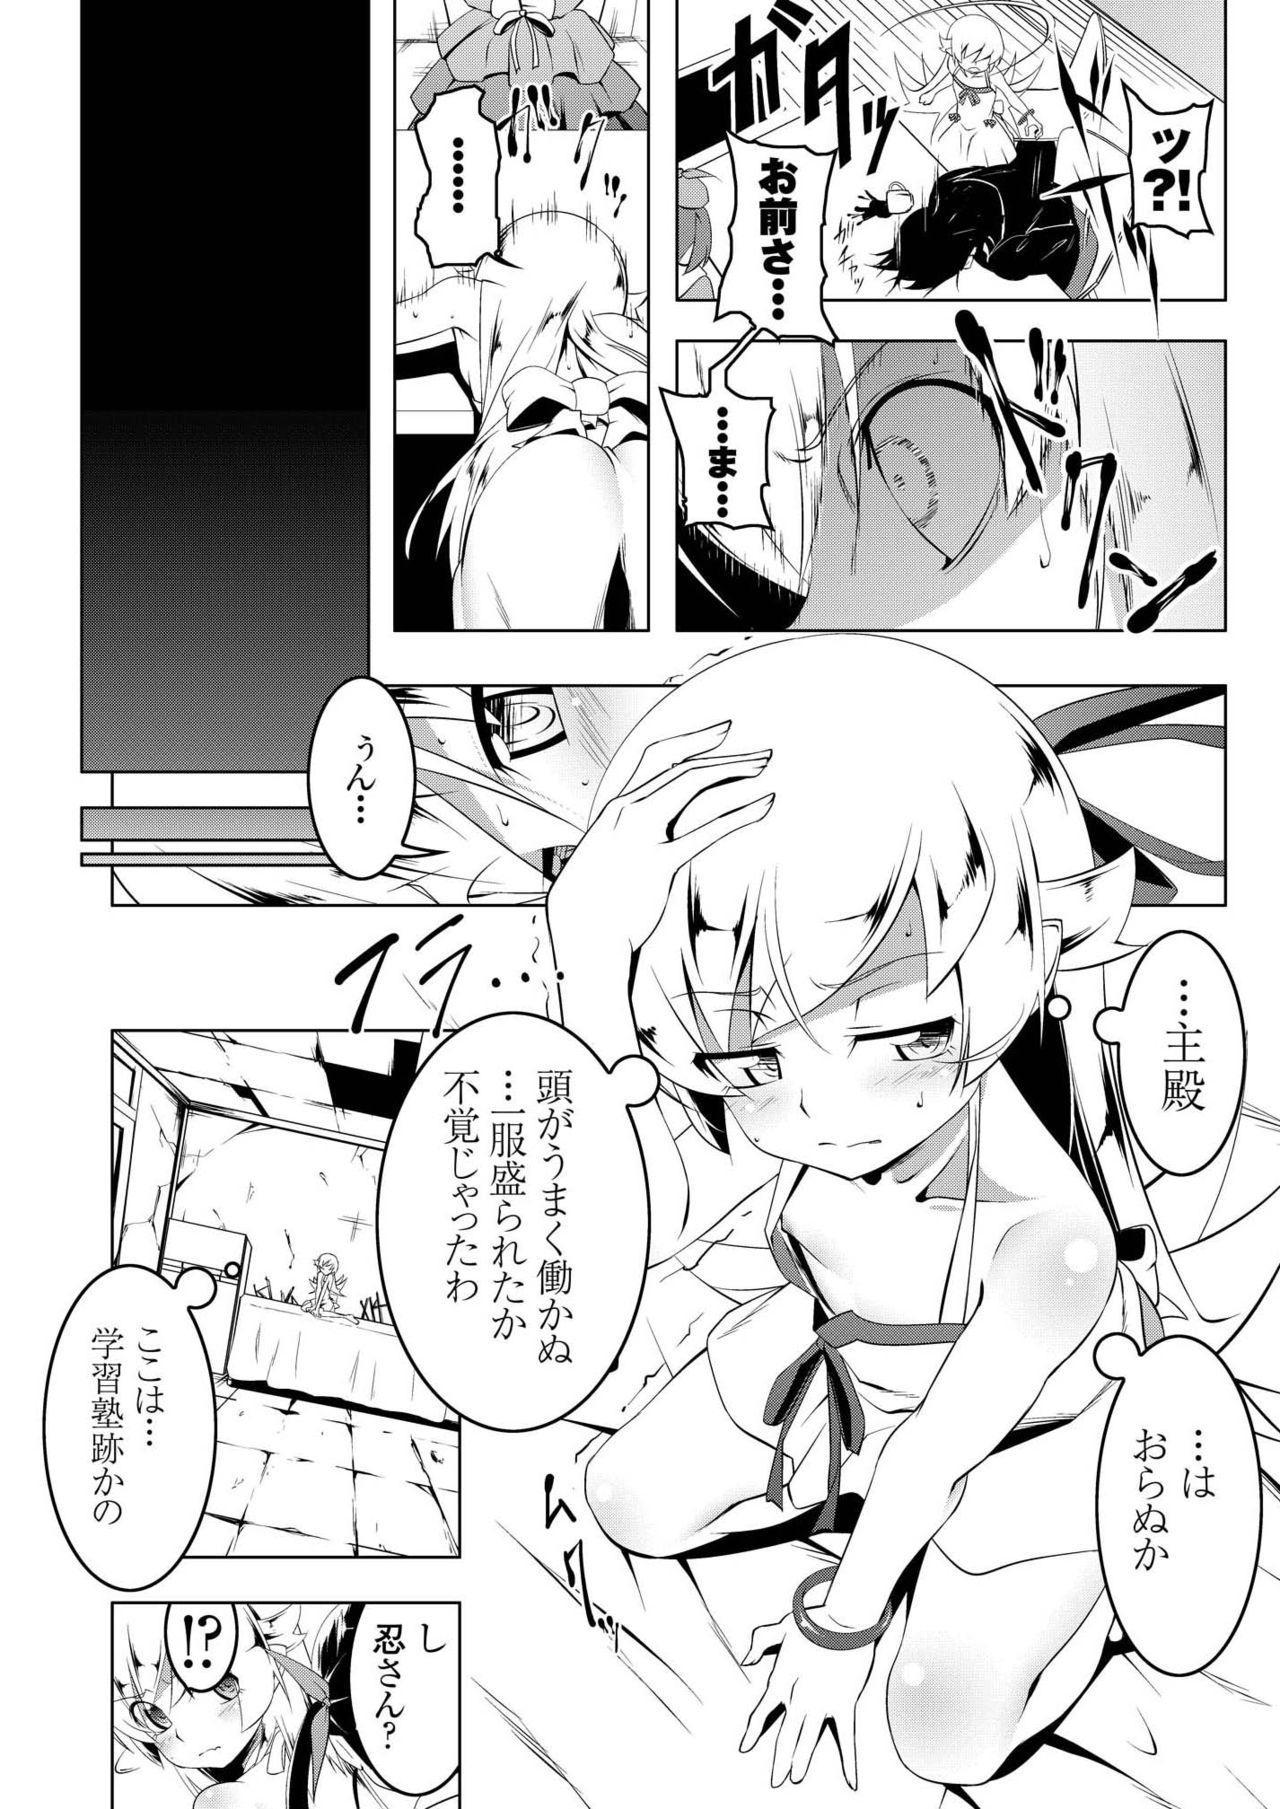 Netoraregatari Soushuuhen Ni 3